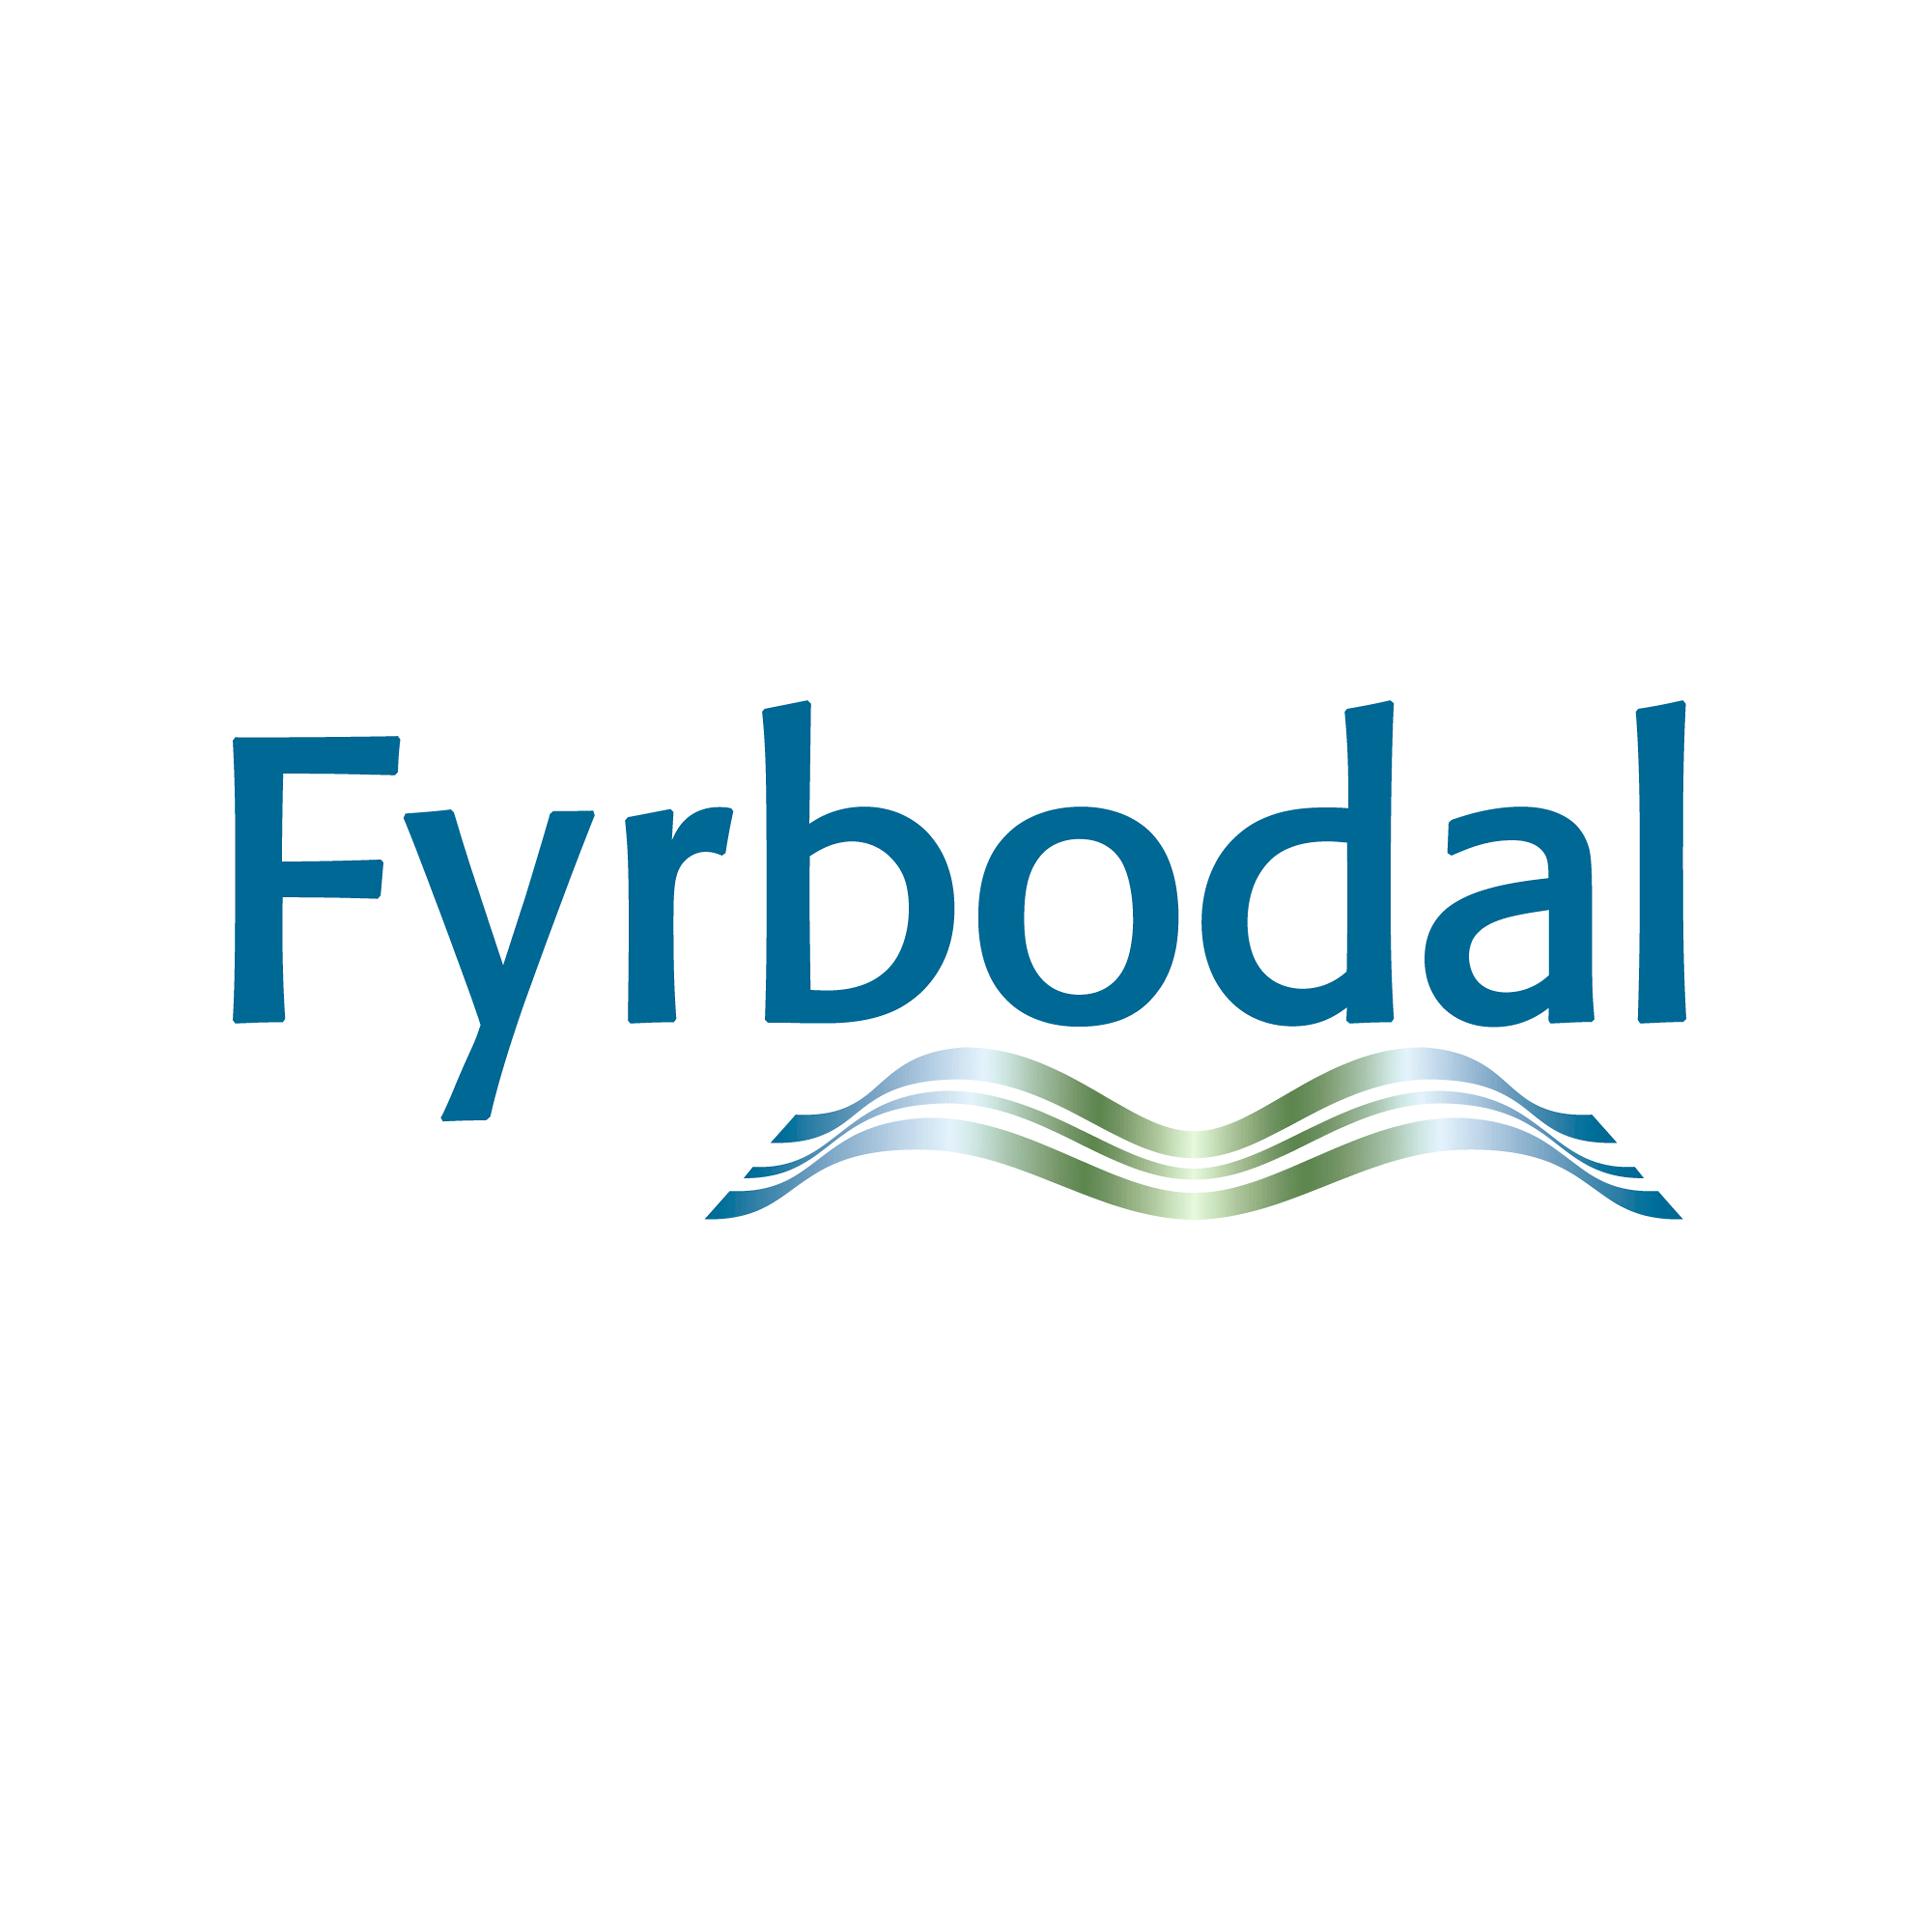 Fyrbodals Kommunalforbund 14 Kommuner Samarbetar For Tillvaxt